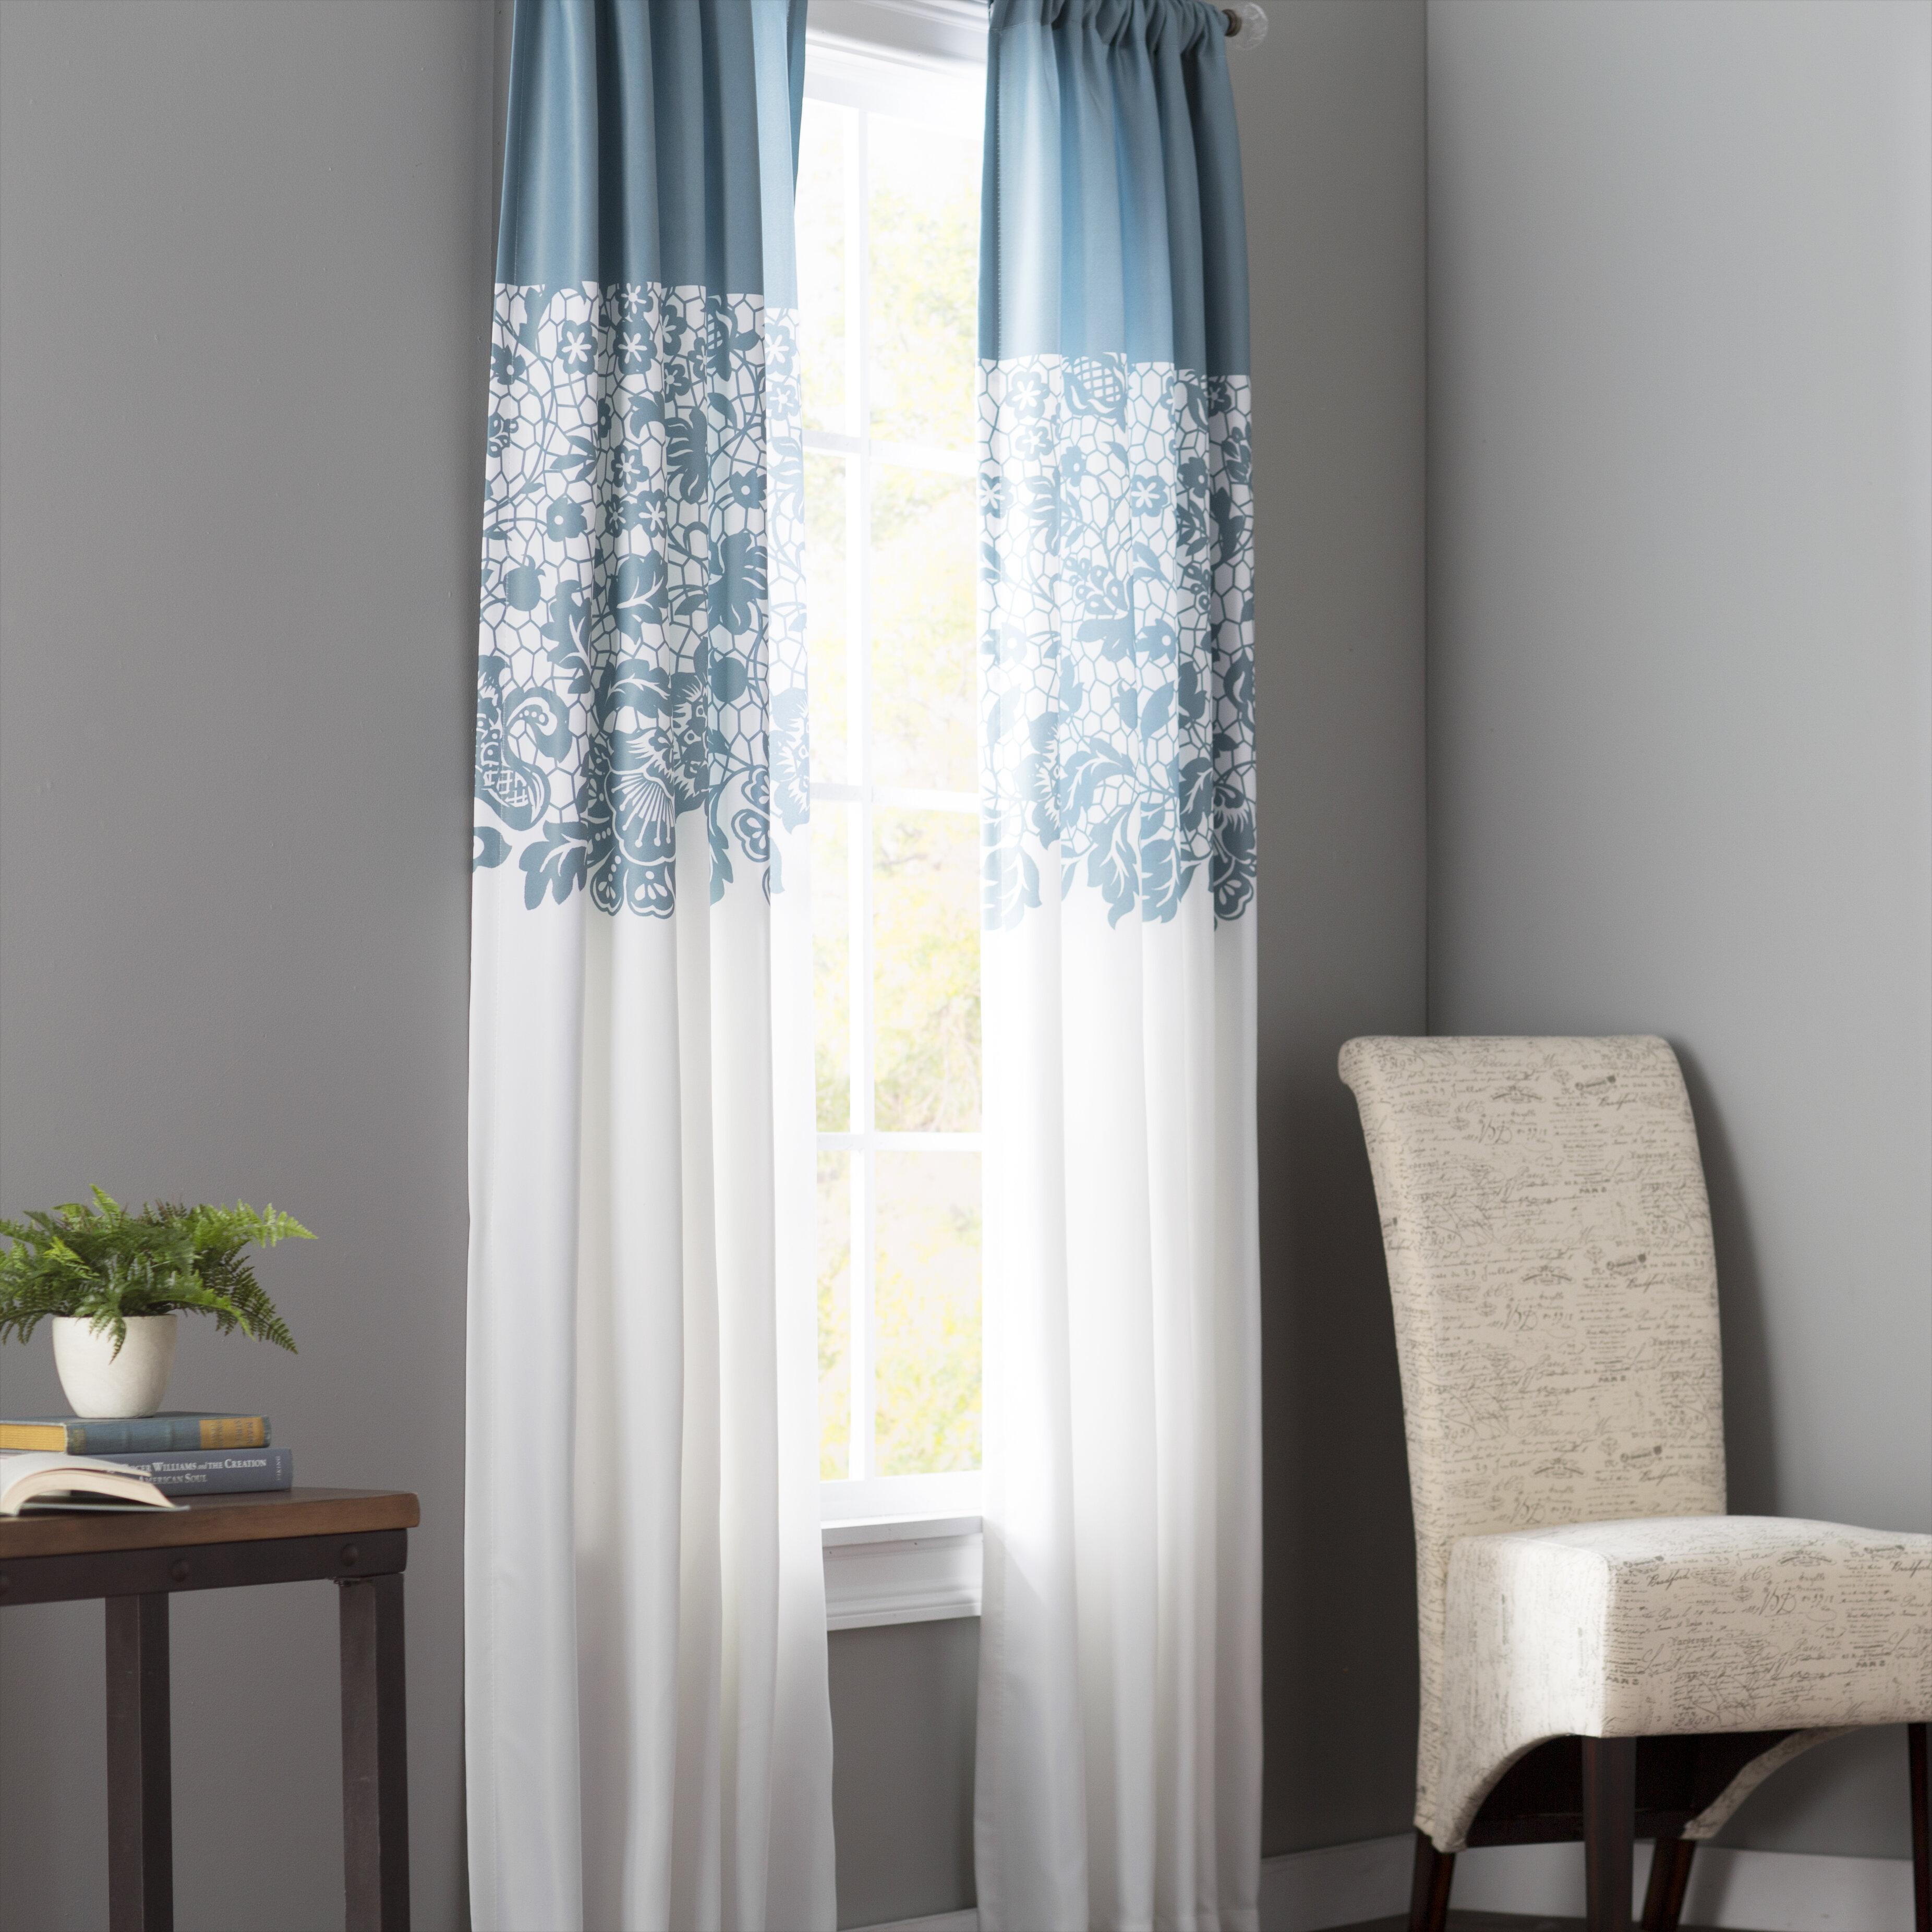 Red Barrel Studio Santa Fe Print Floral Room Darkening Thermal Rod Pocket Curtain Panels Reviews Wayfair